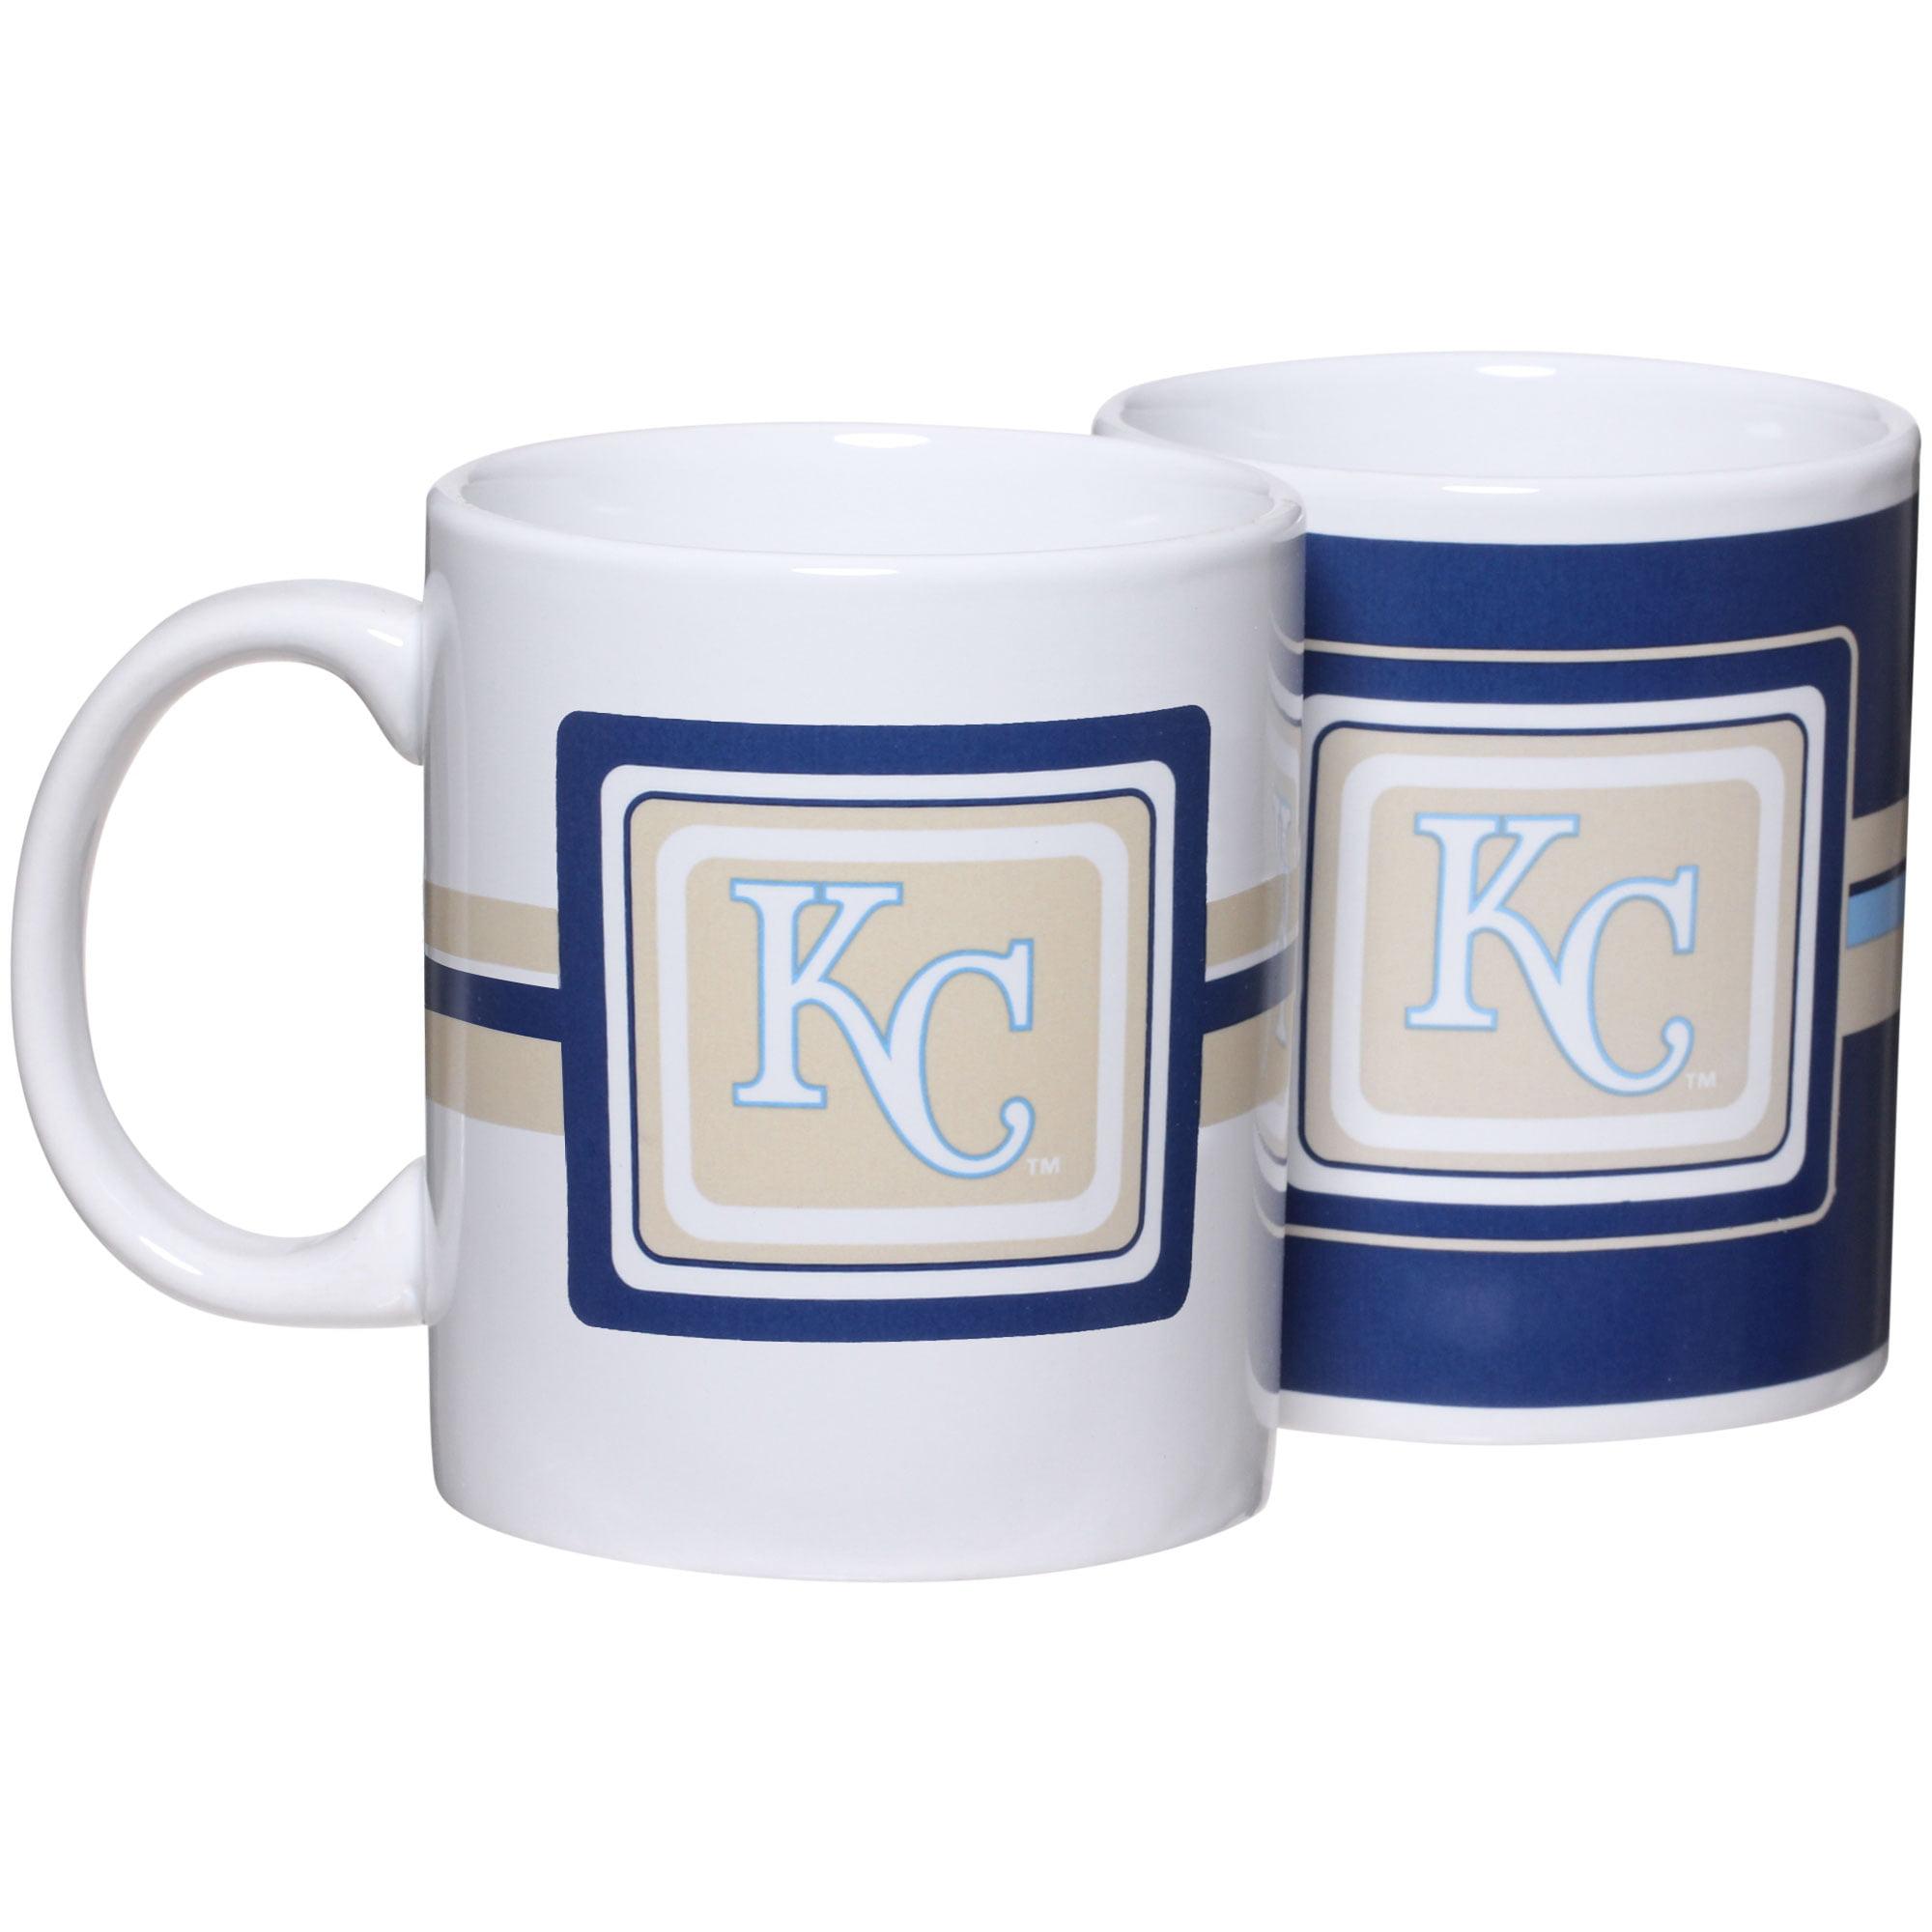 Kansas City Royals 11oz. Two-Pack Mug Set - No Size